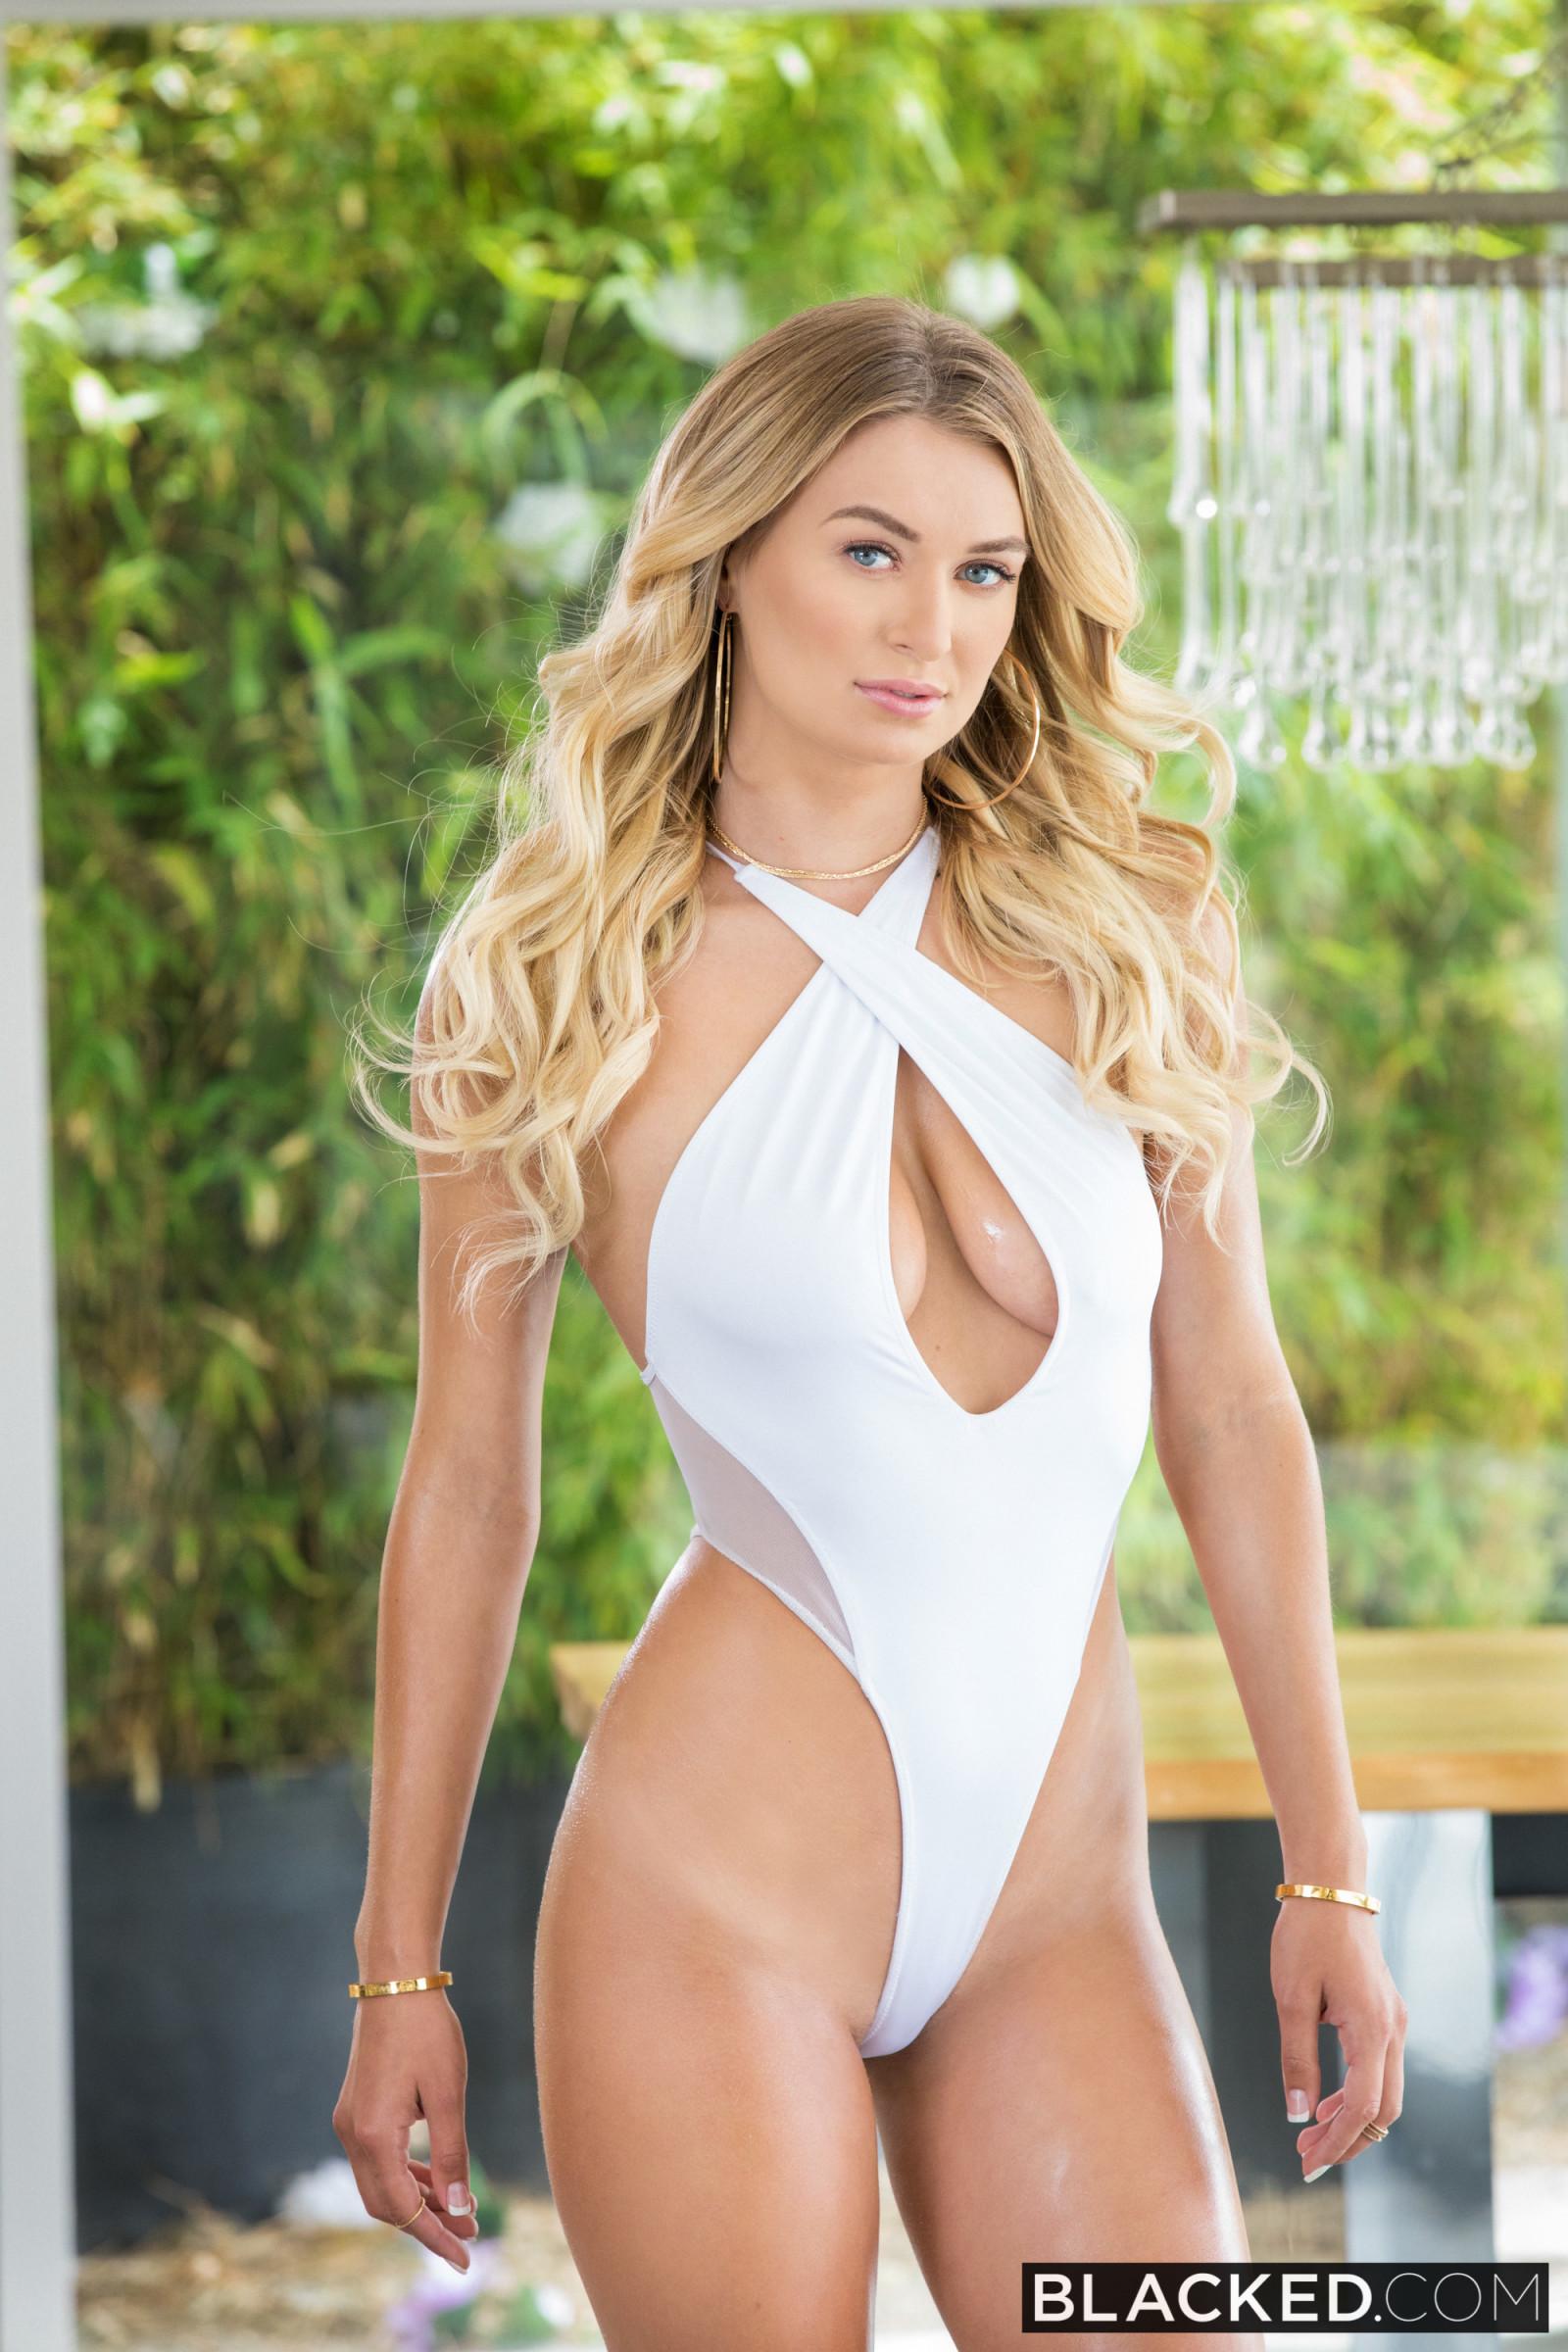 Wallpaper  Natalia Starr, Model, Women, Actress, Looking -3749